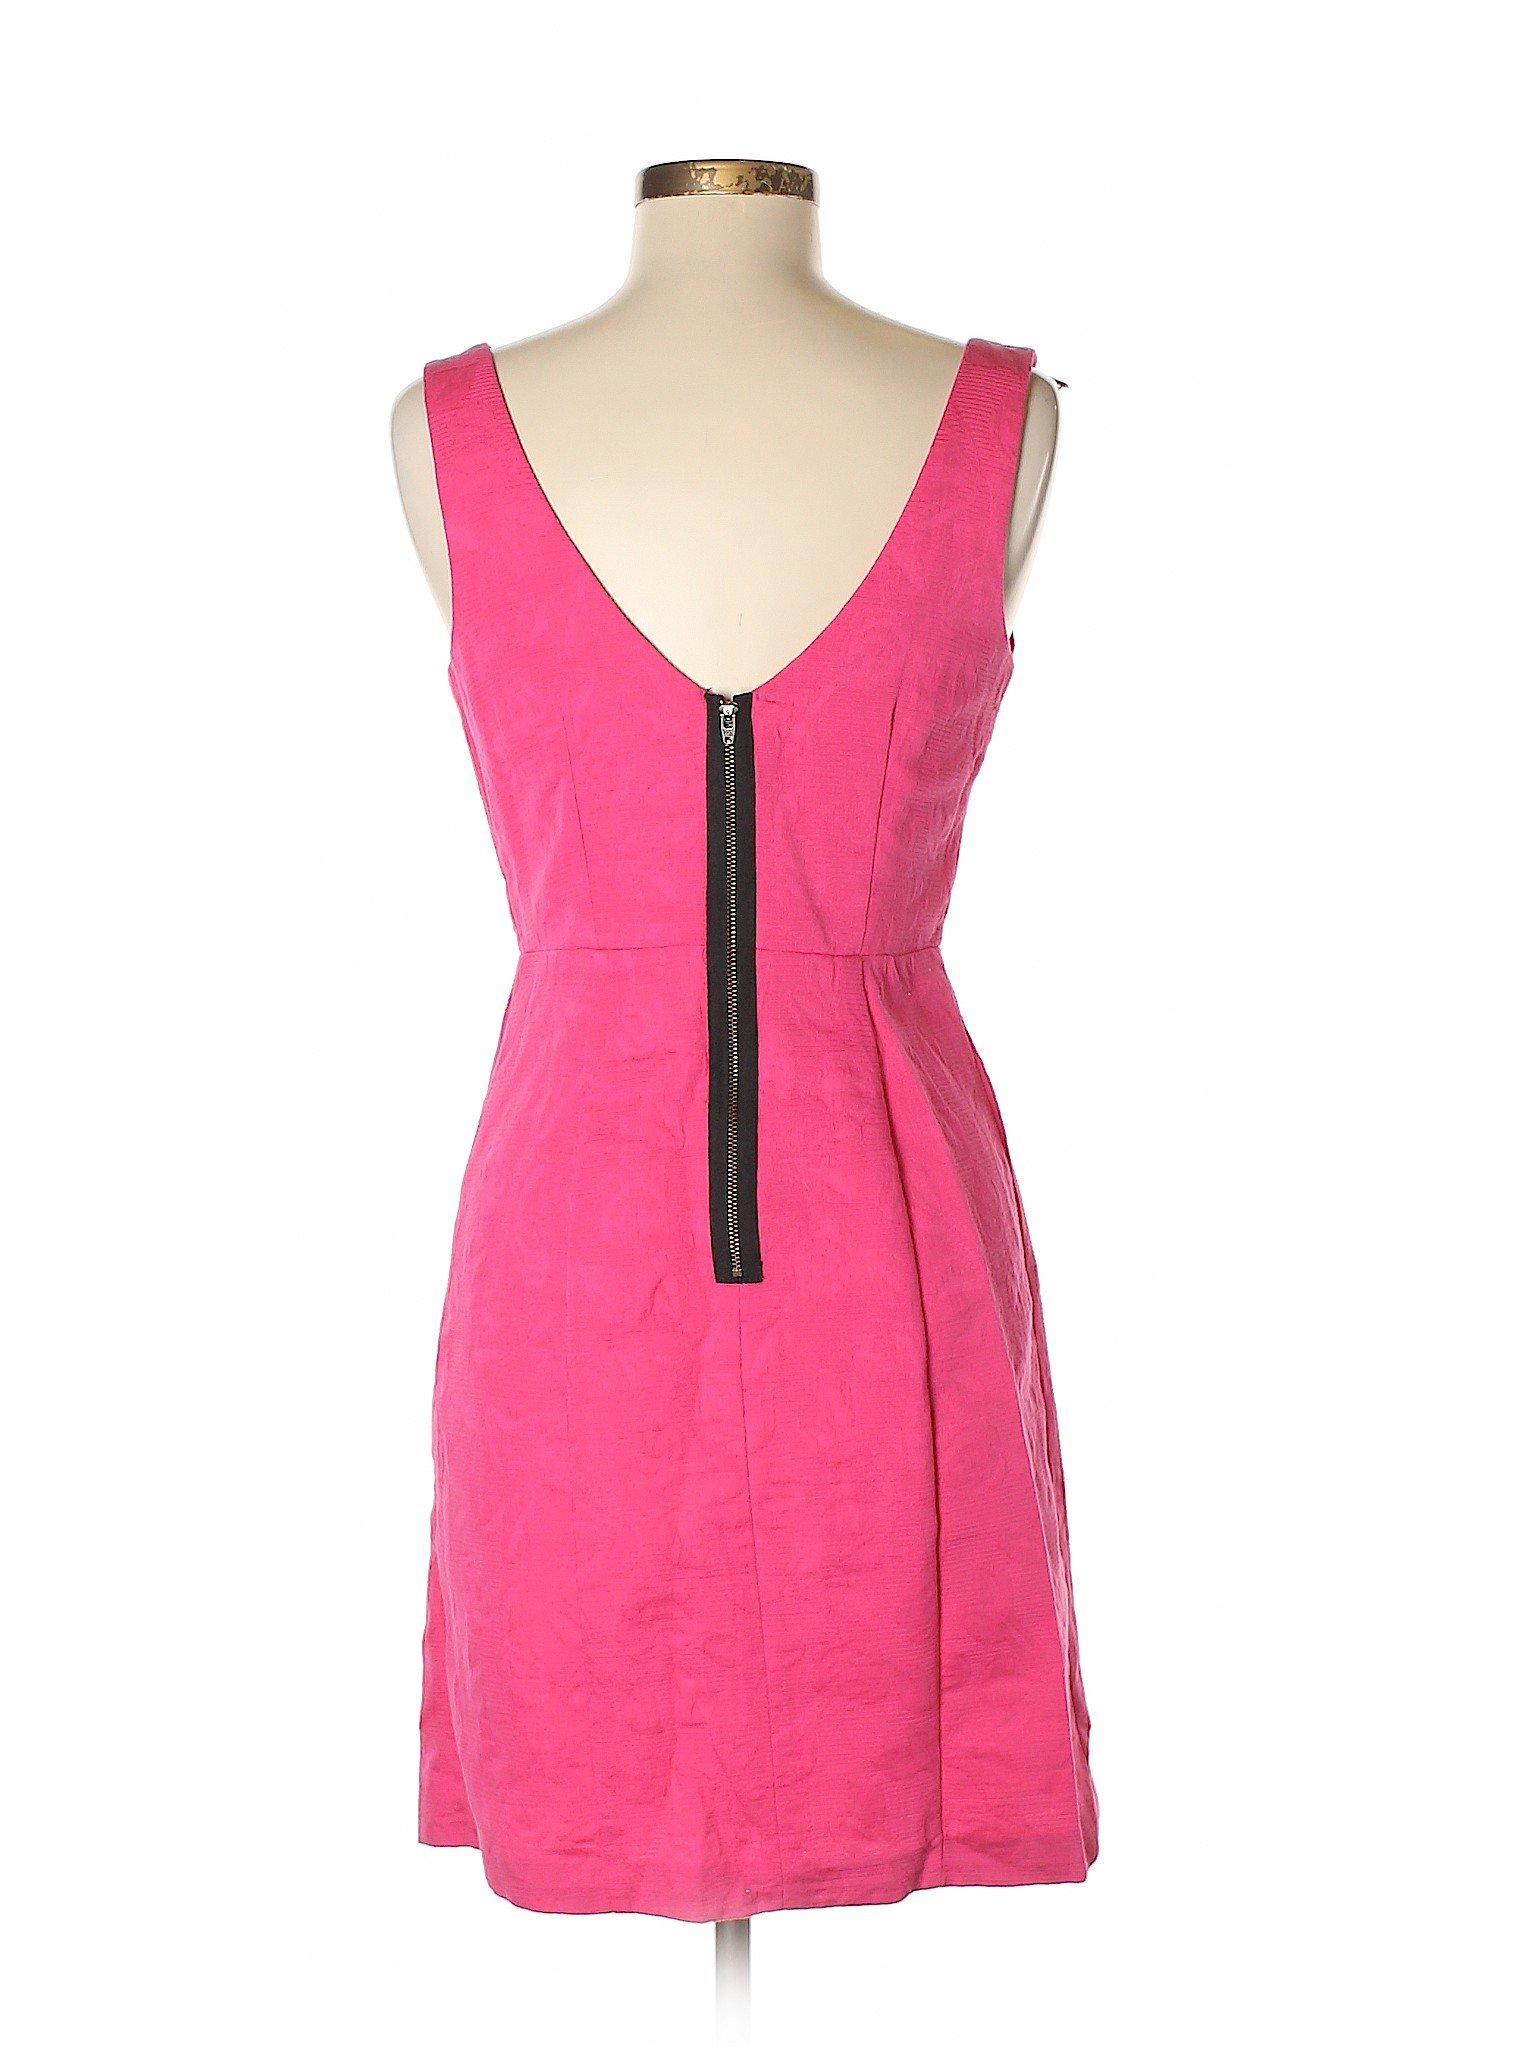 Casual Tiana B Dress Selling Tiana Selling UxqZ7gS6nw